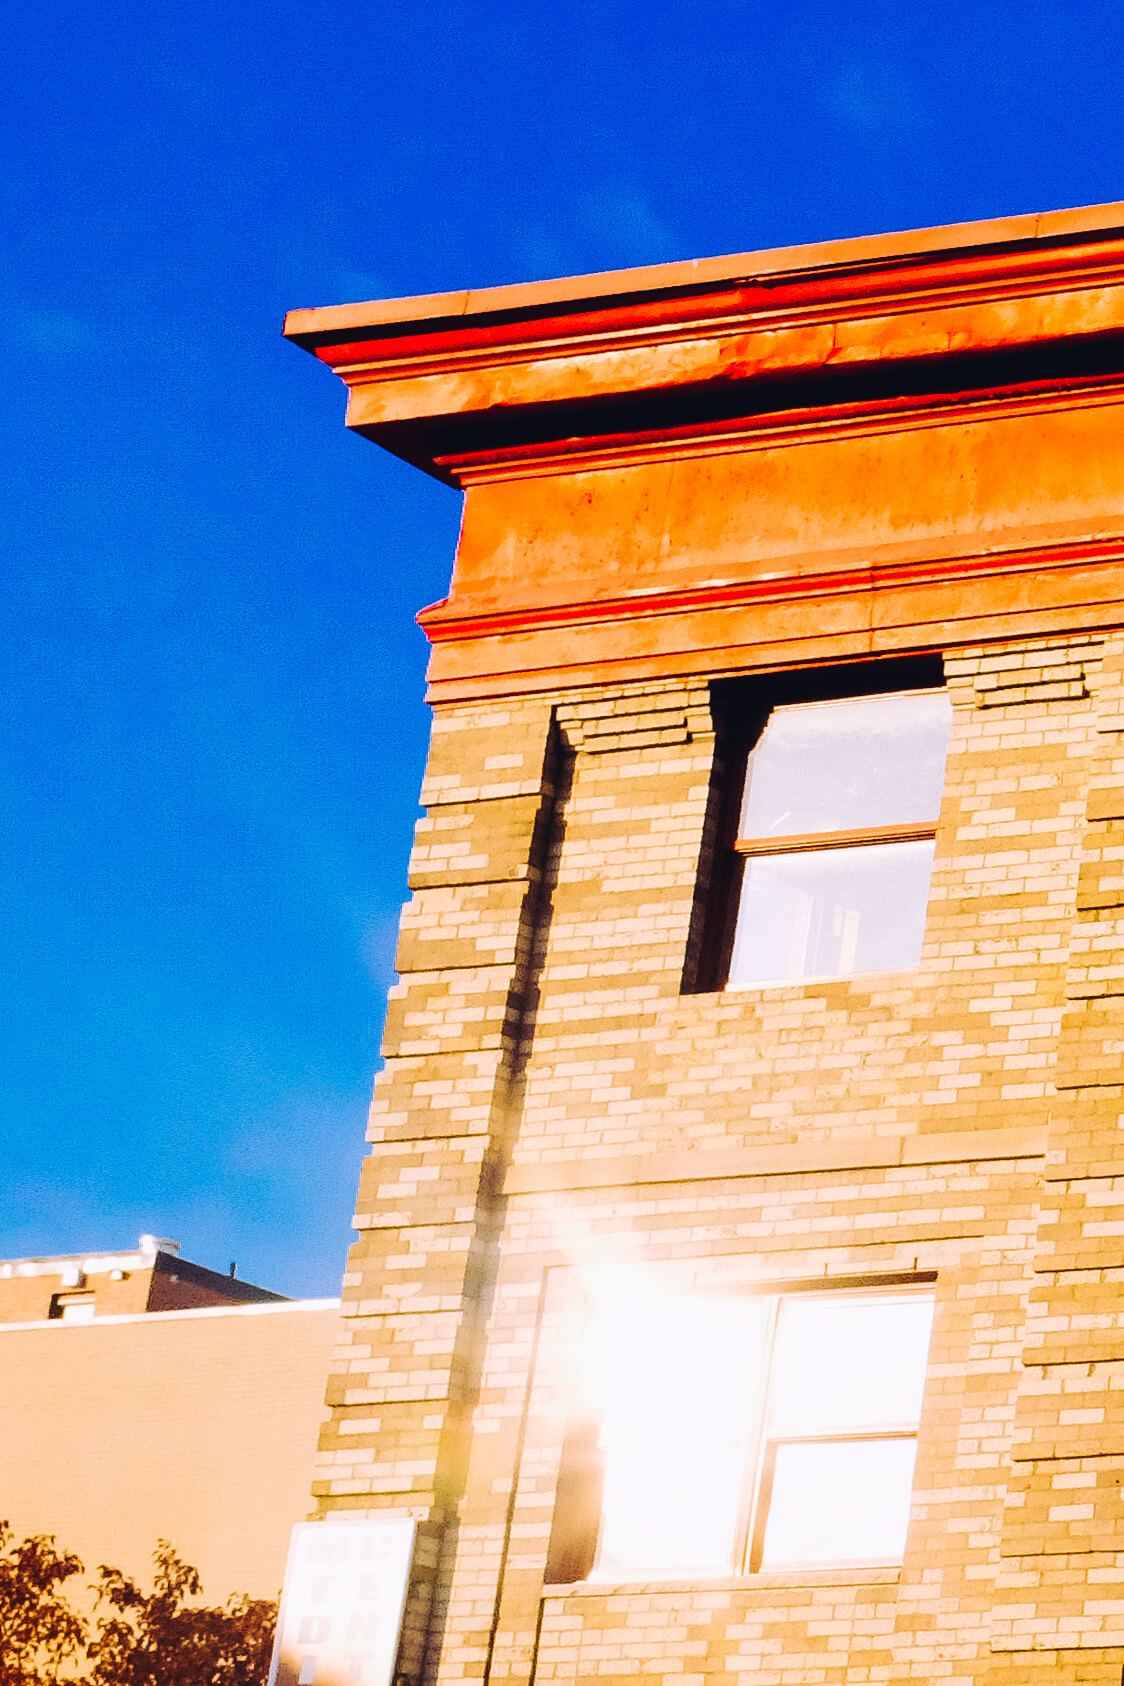 strangers-windows-brooklyn.jpg